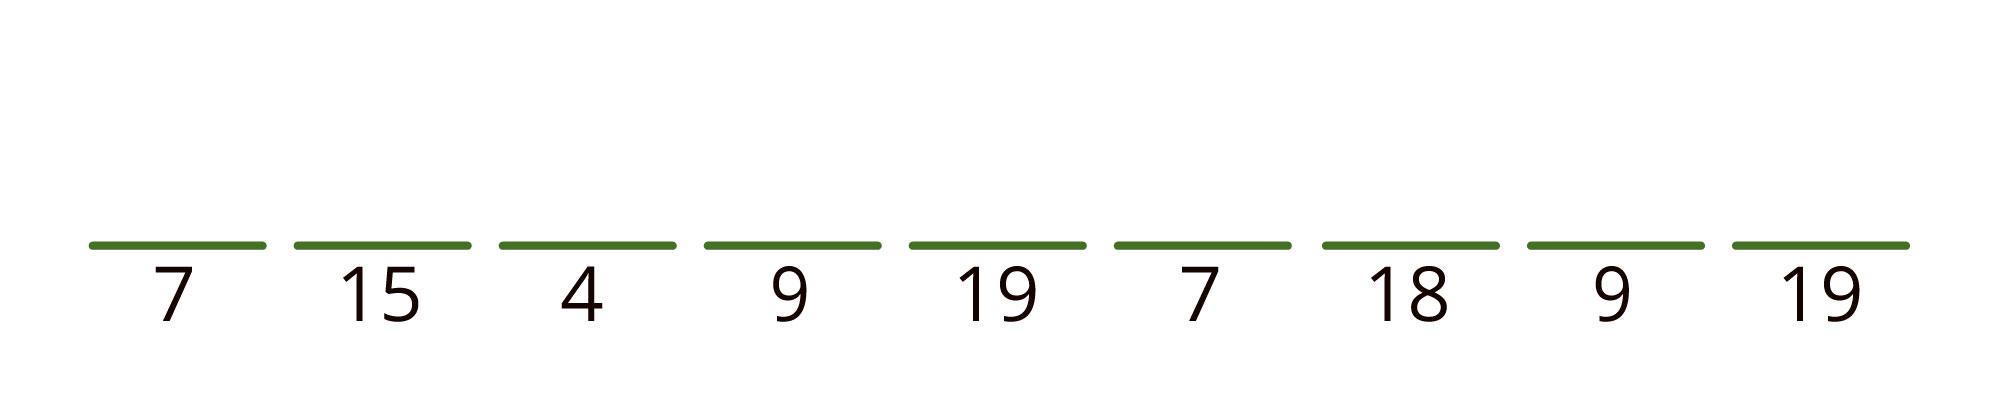 7 15 4 9 19 7 18 9 19